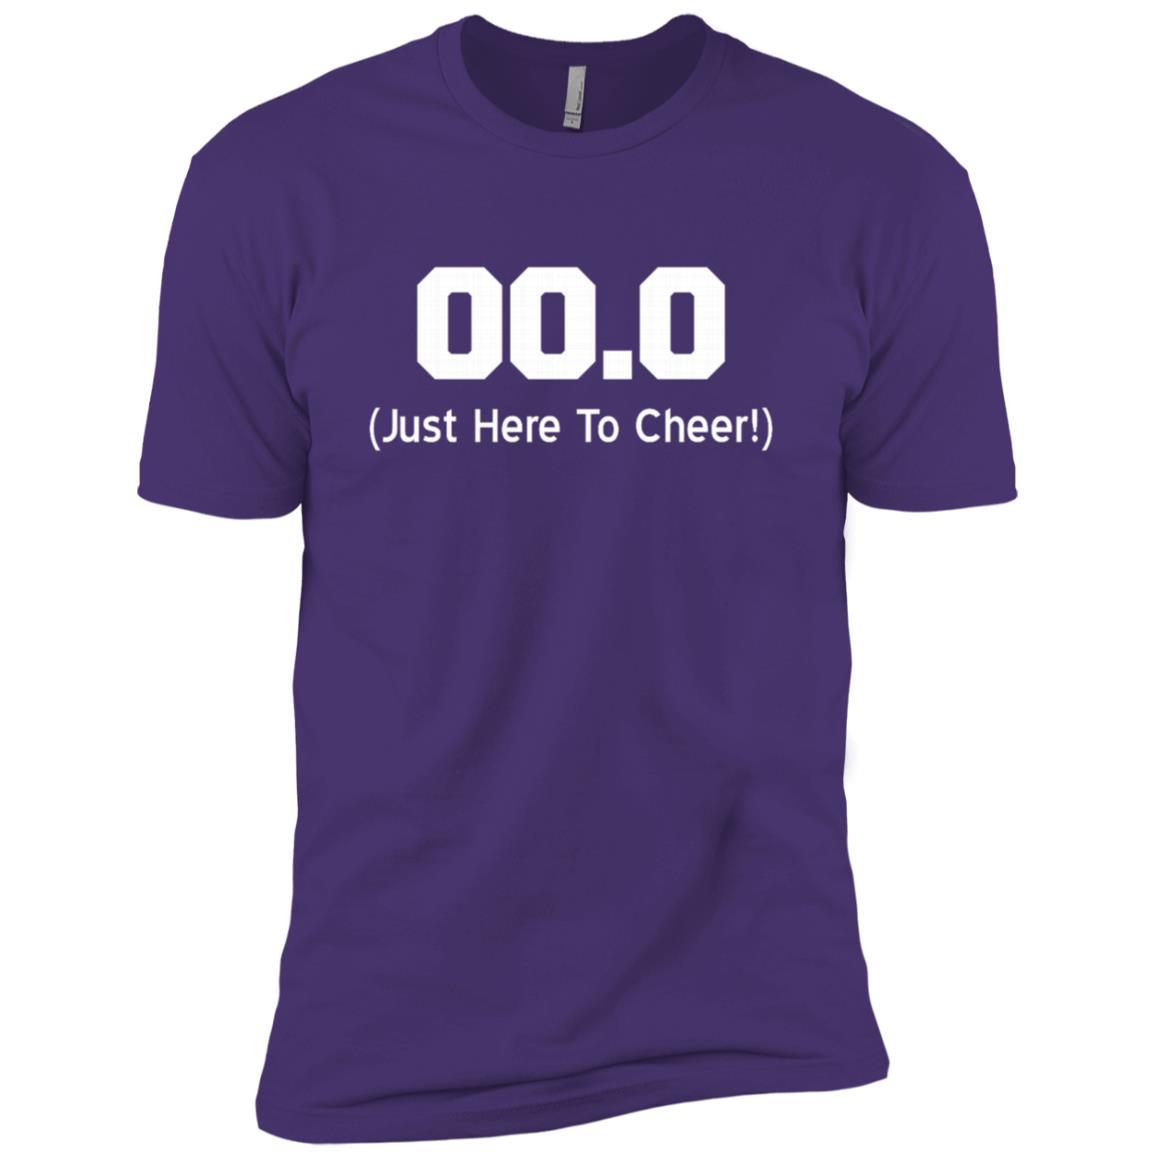 00.0 Just Here To Cheer Running Spectator Men Short Sleeve T-Shirt